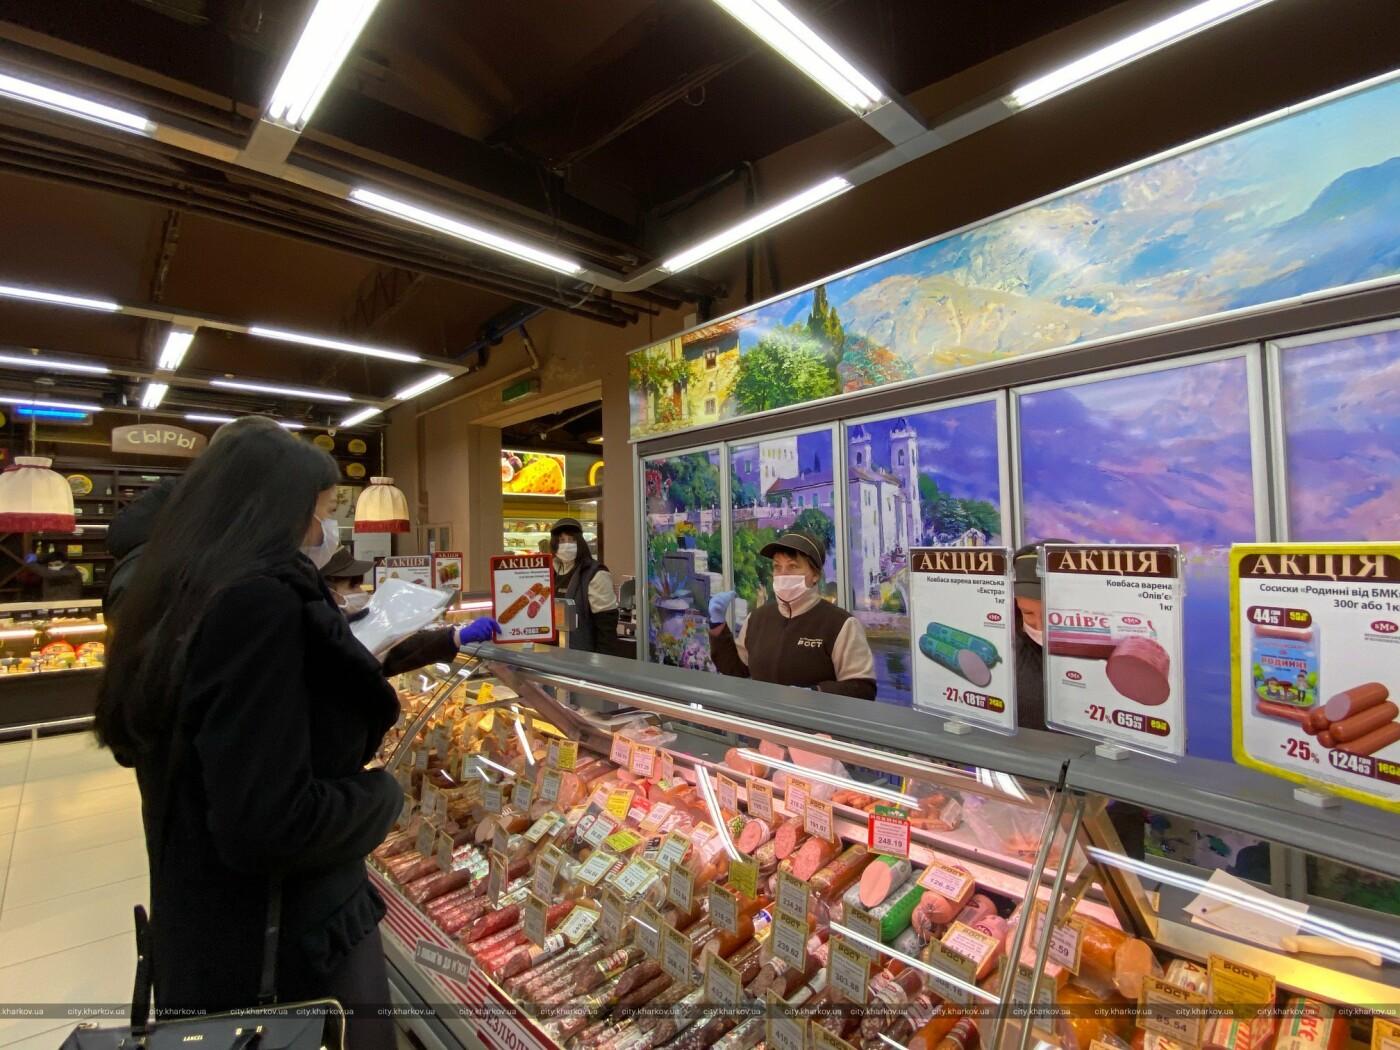 В Харькове проверили работу двух супермаркетов во время карантина, - ФОТО, фото-3